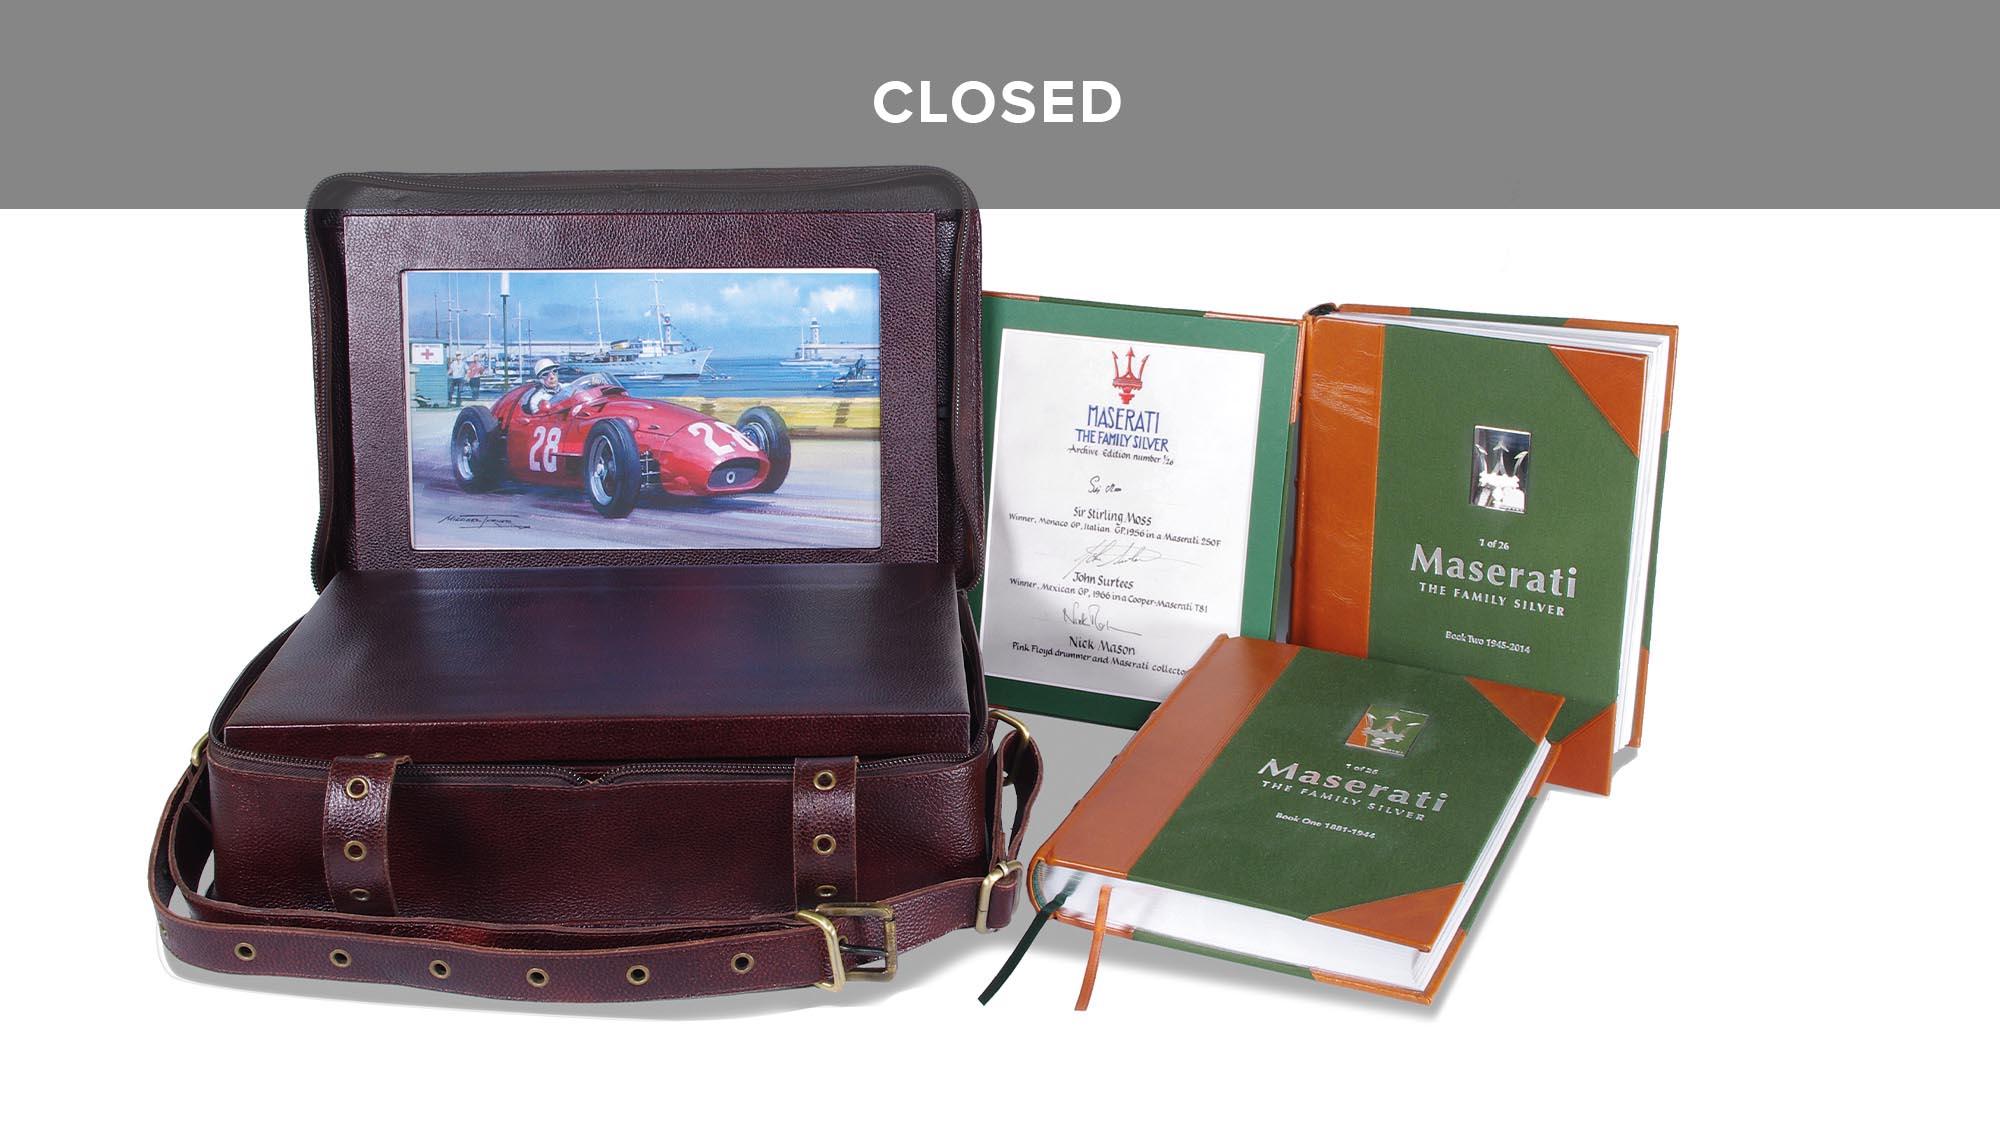 Maserati closed